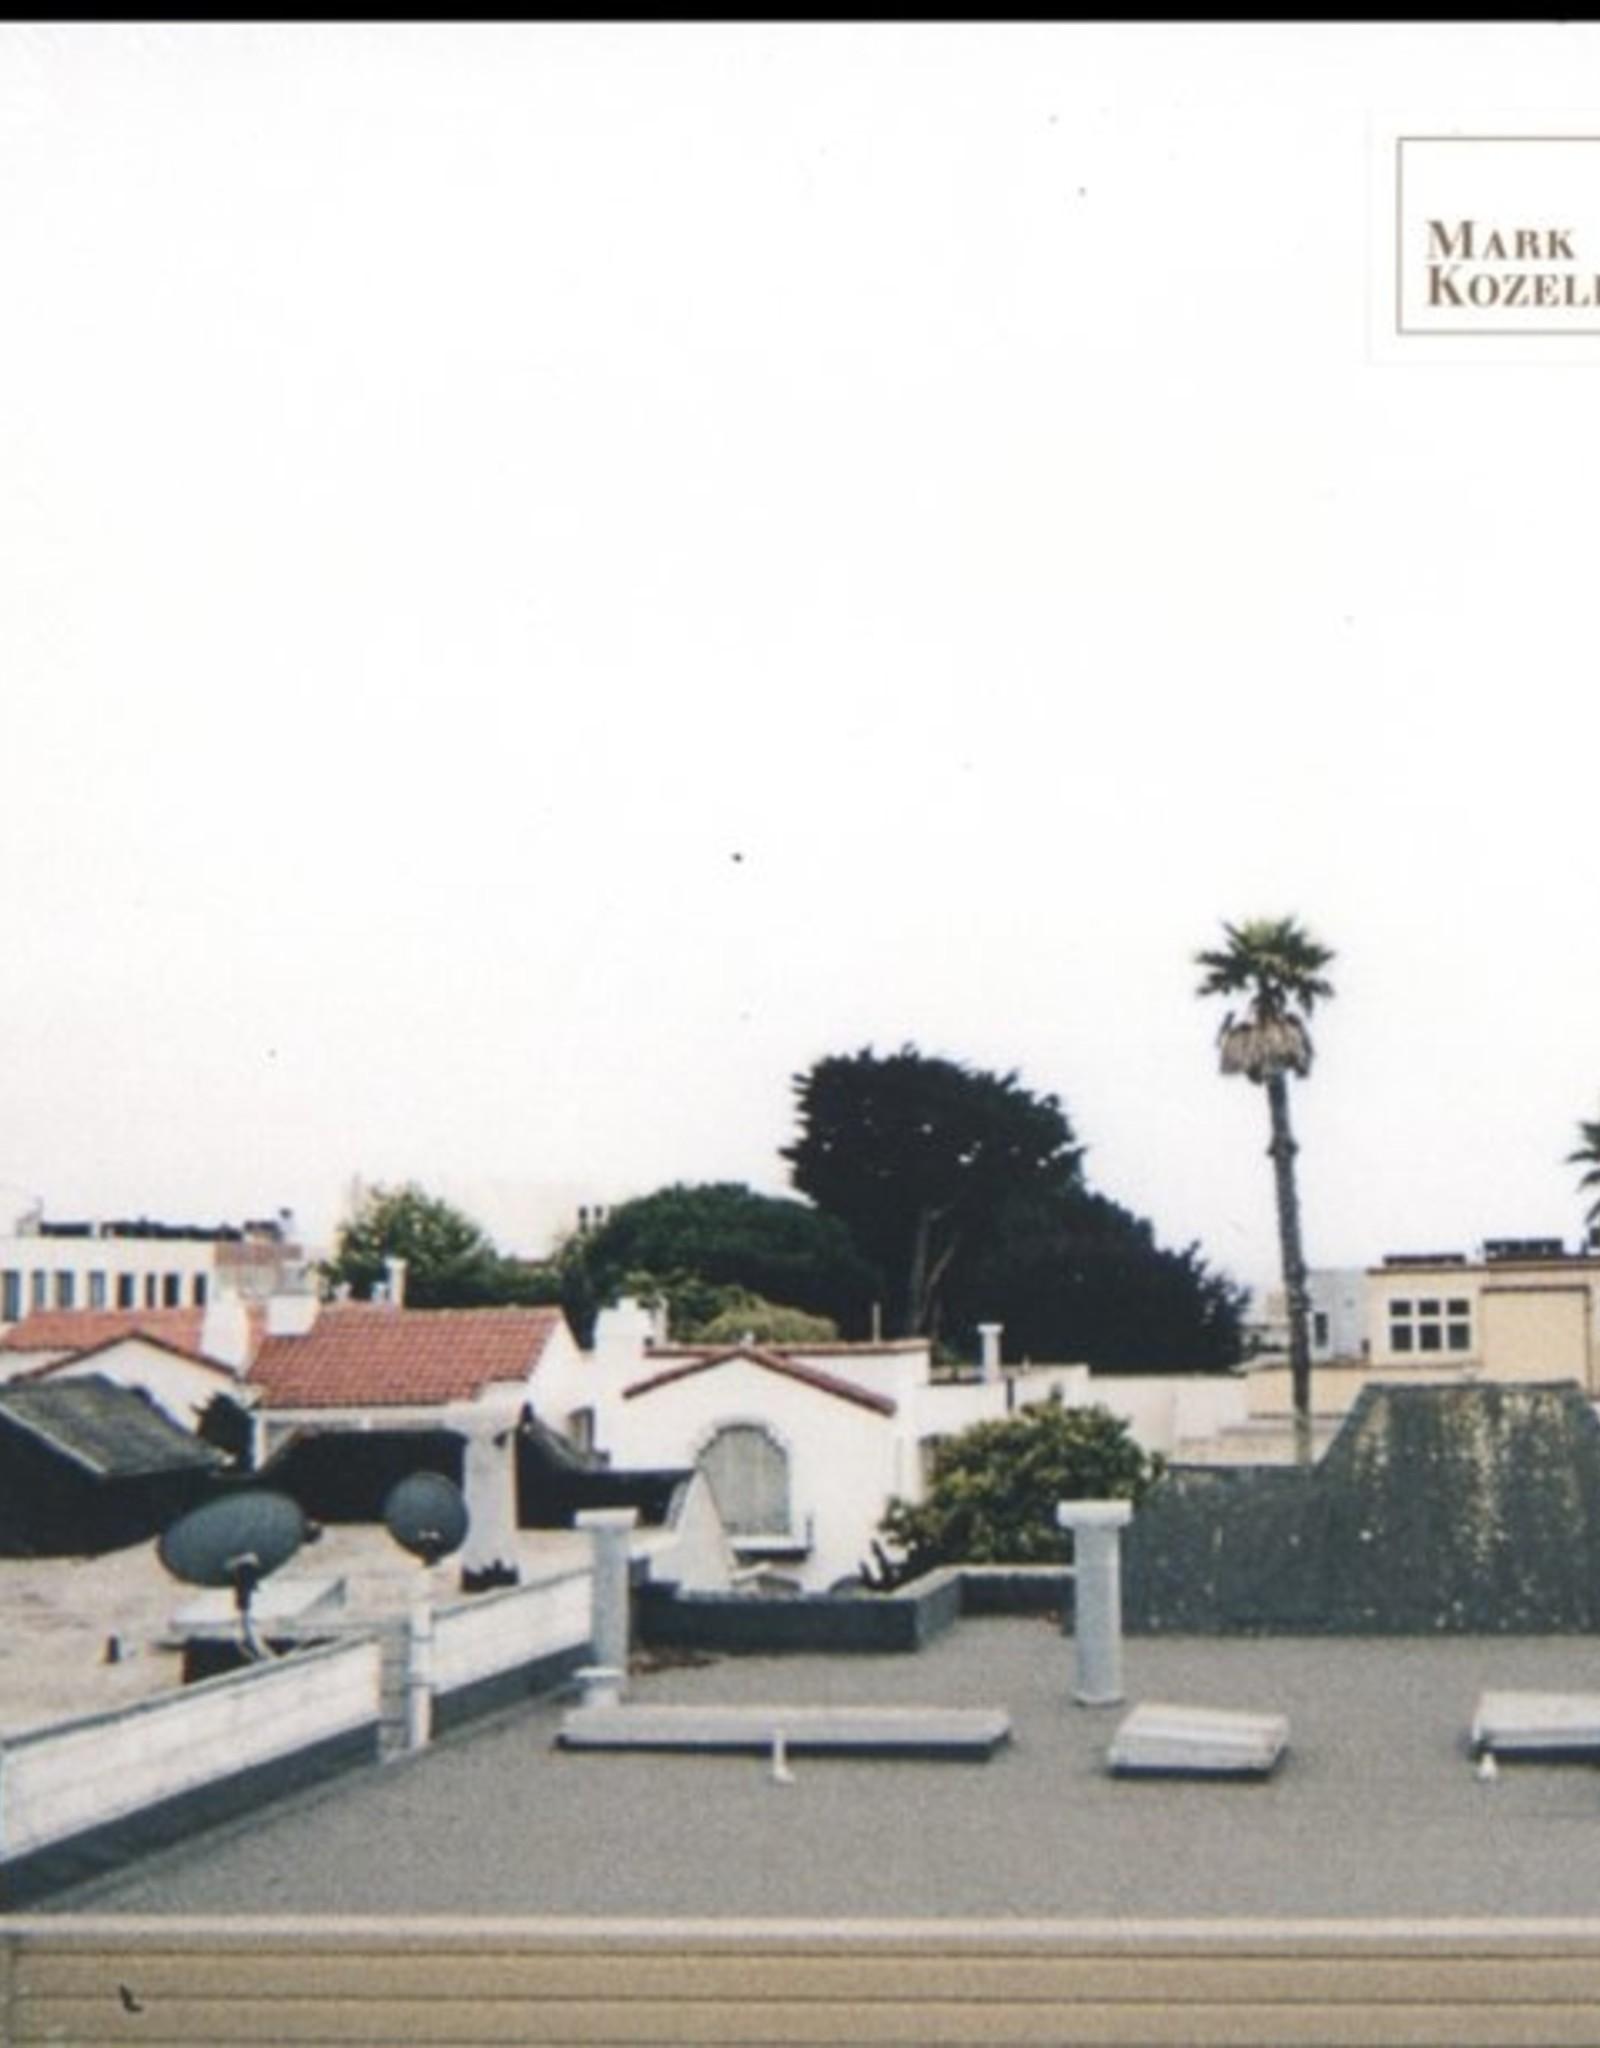 Mark Kozelek - Mark Kozelek (Vinyl)